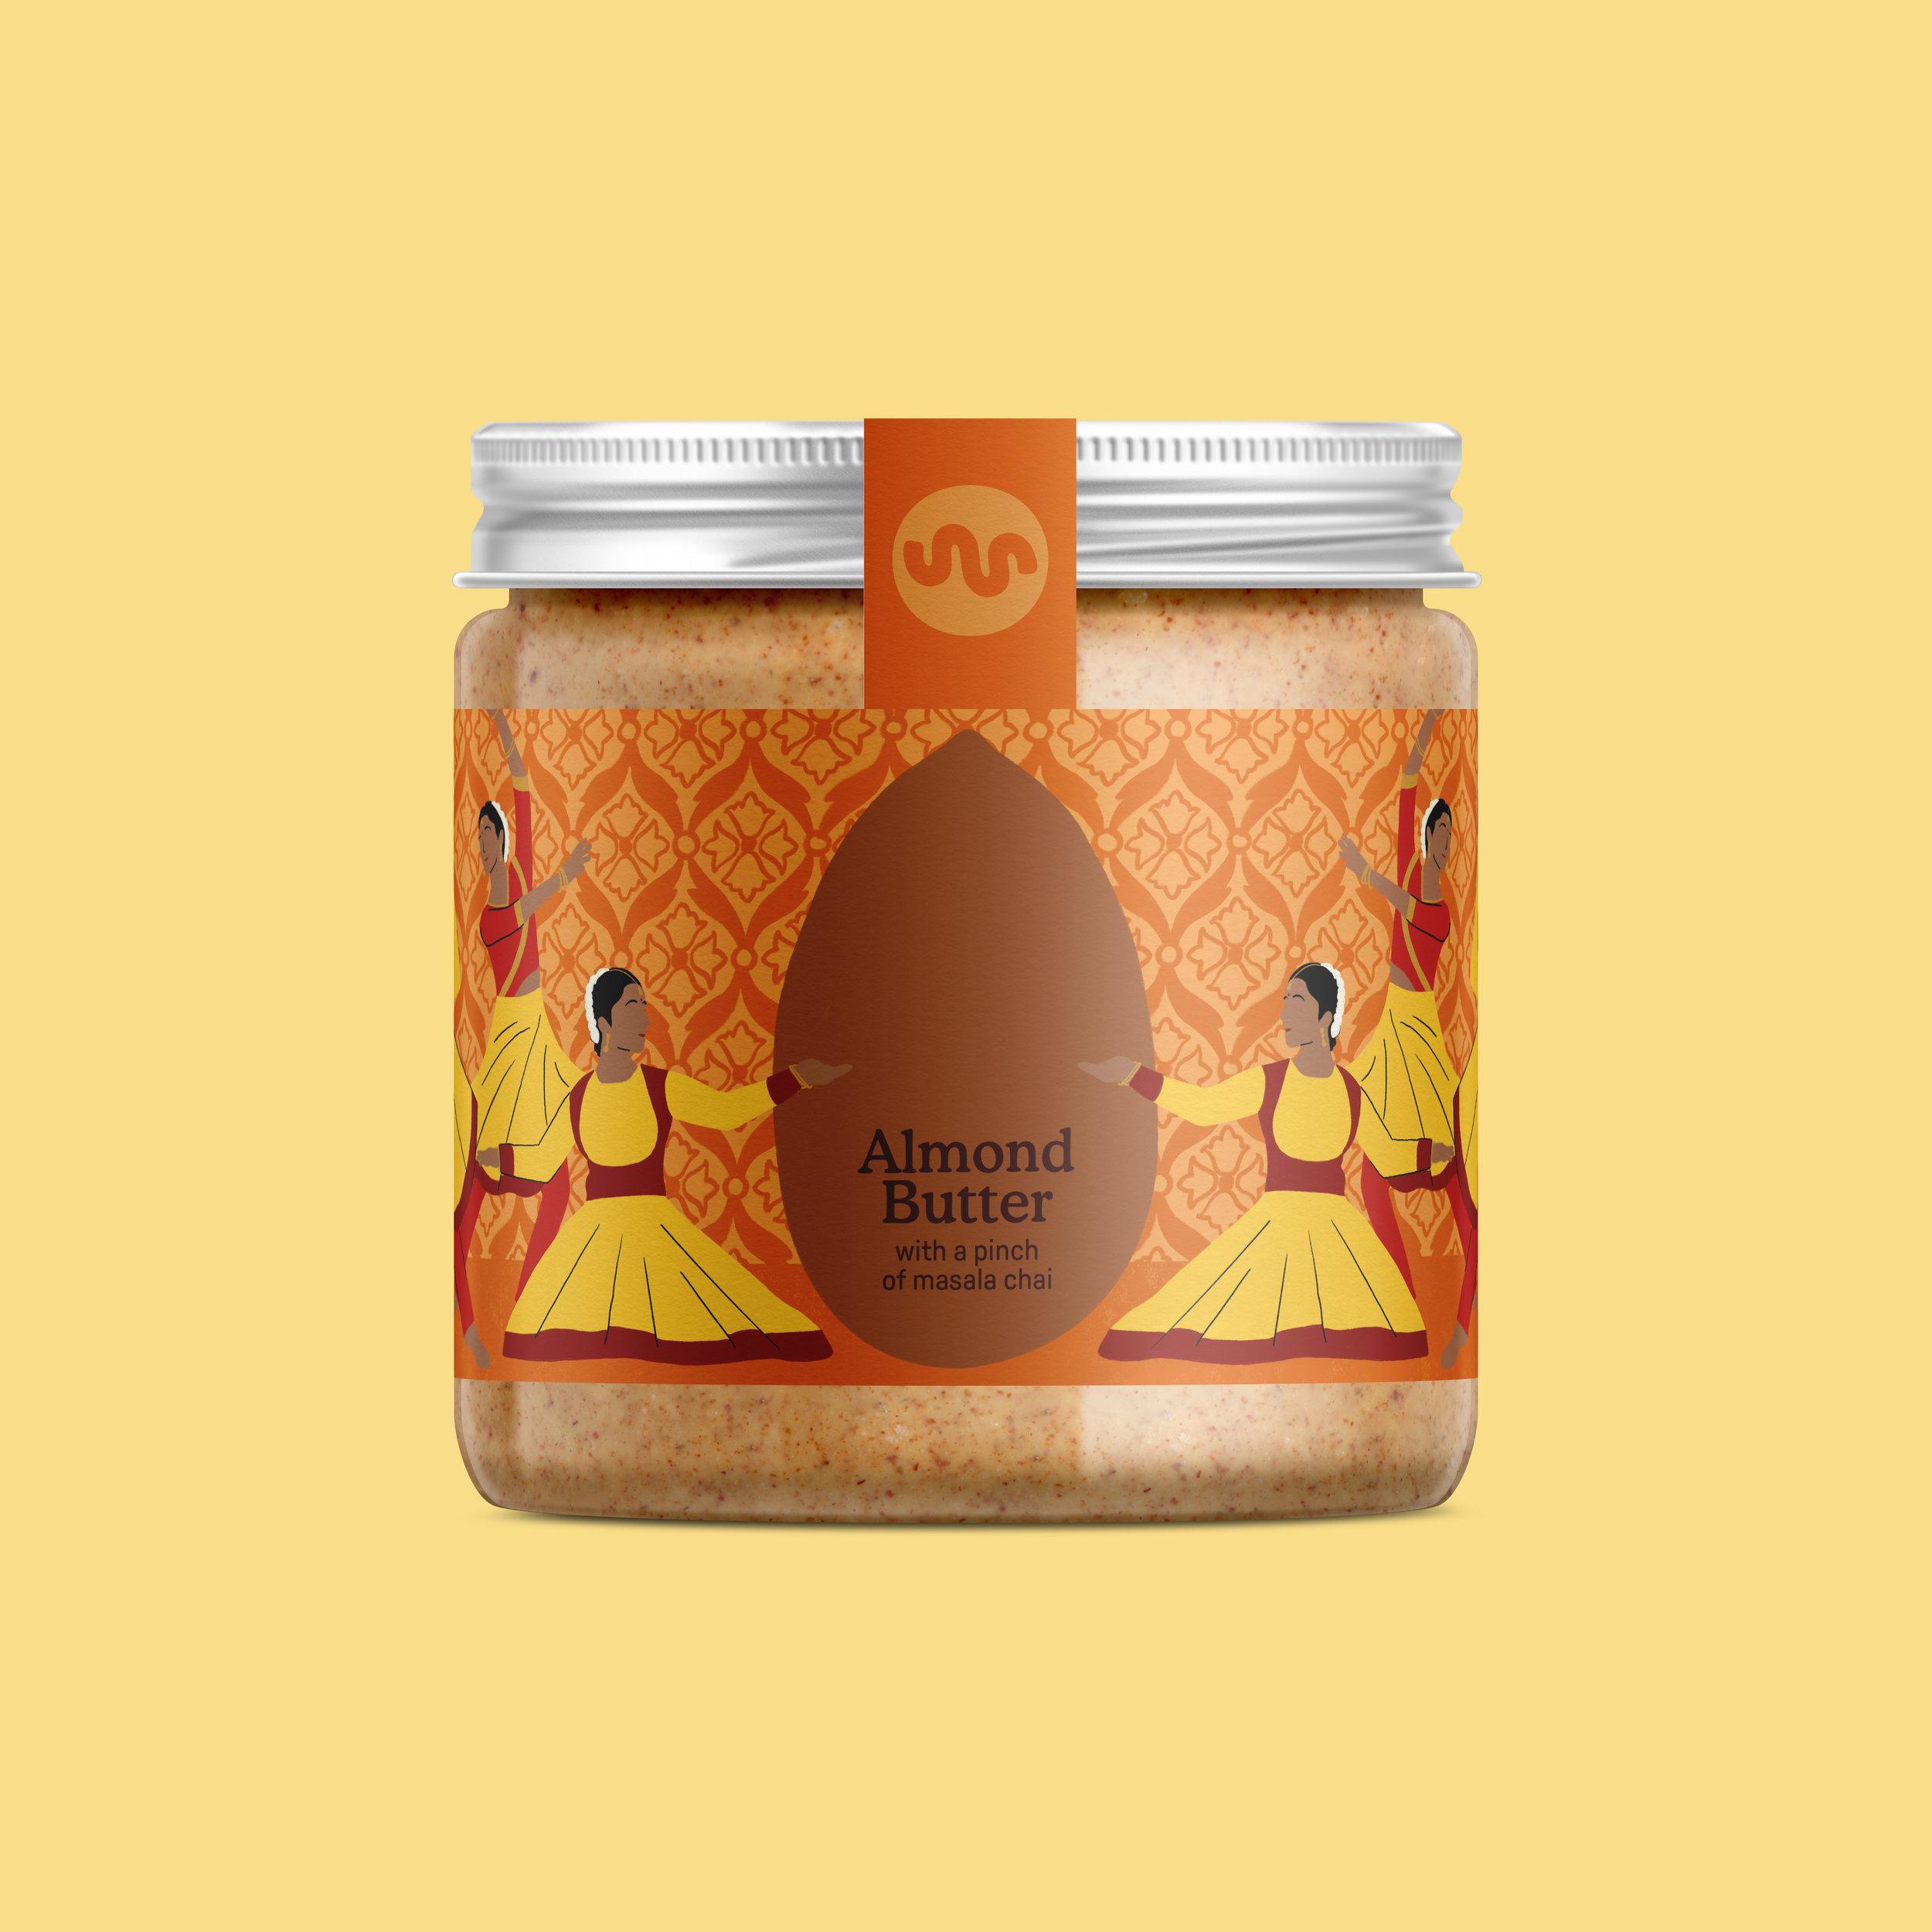 SO-SAVOURY-Almond-Masala-Chai-Nut-Butter.jpg